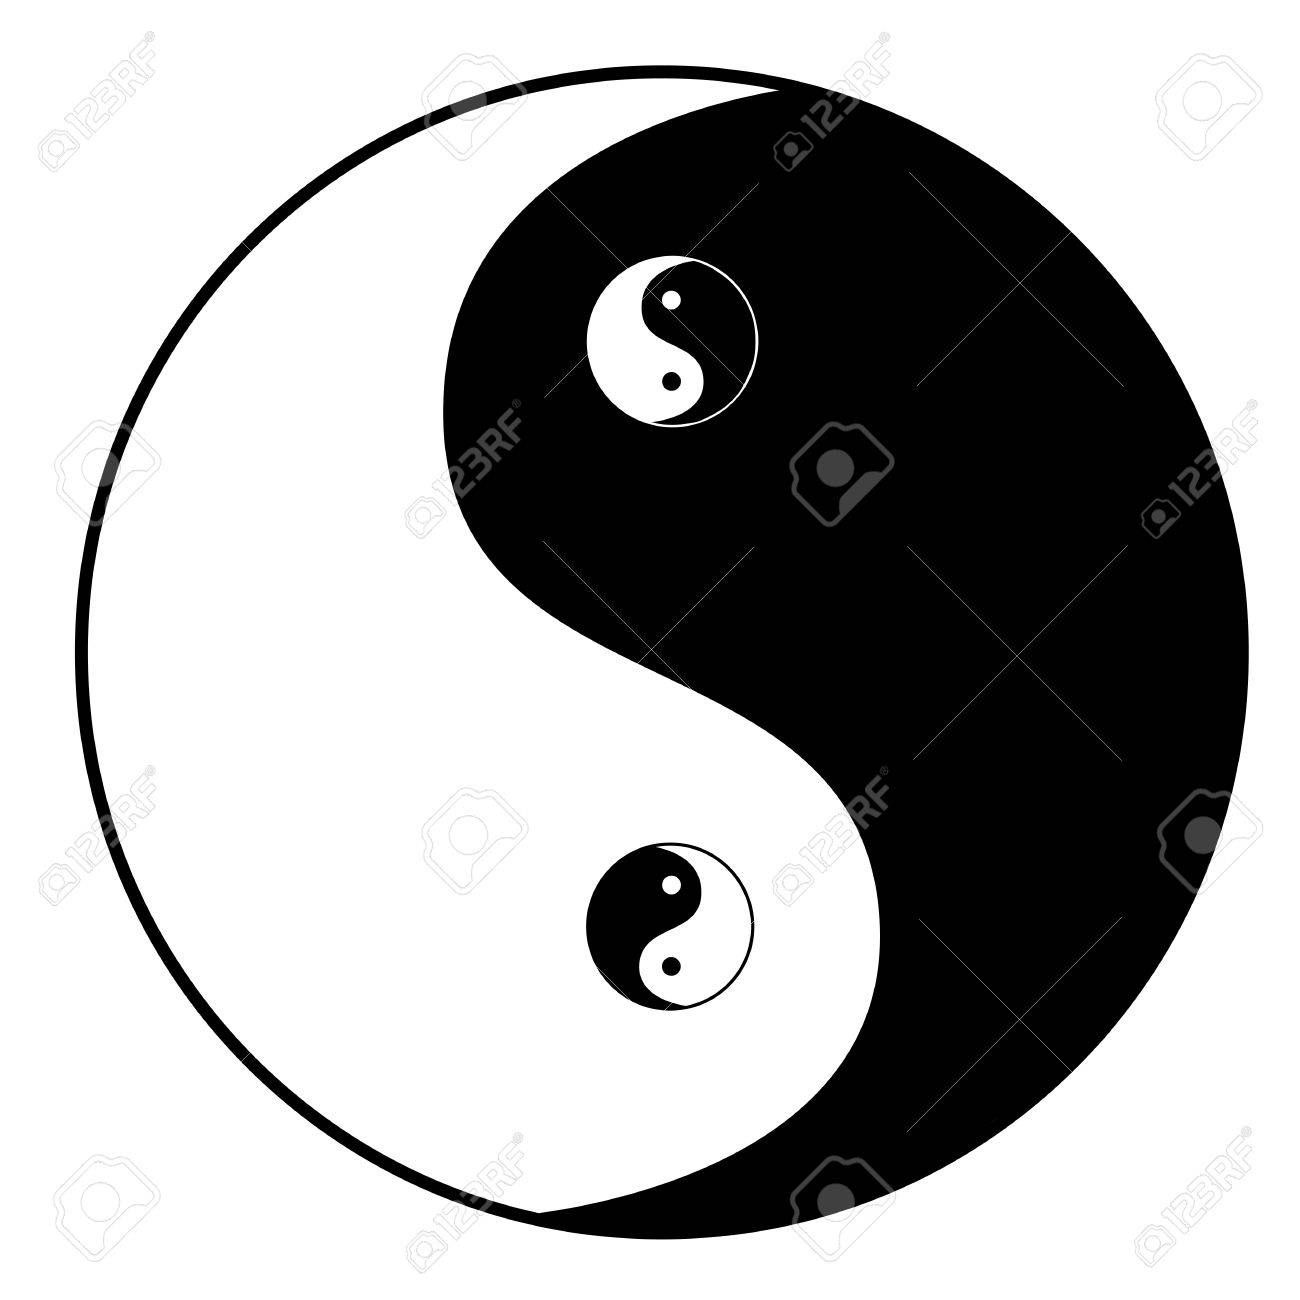 Ying yang symbol - 17301781